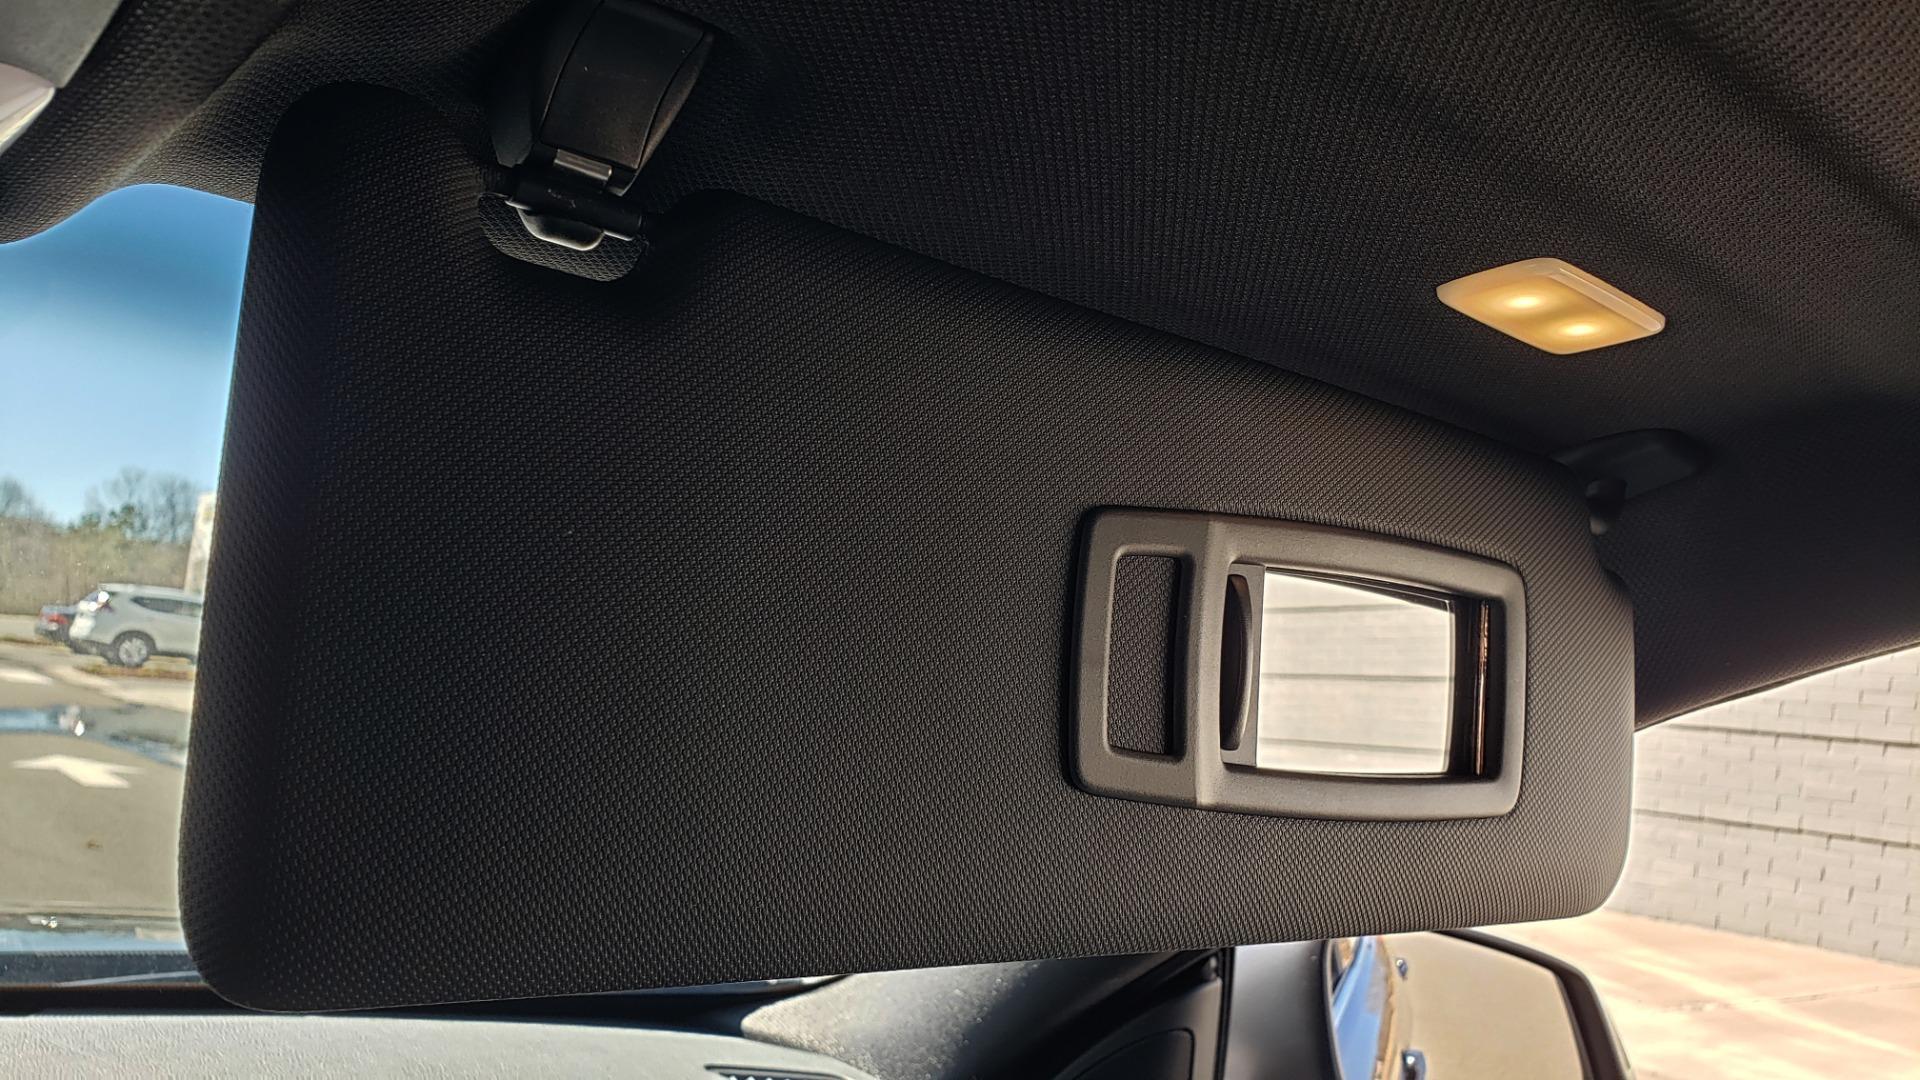 Used 2018 BMW 4 SERIES 430IXDRIVE / PREMIUM / NAV / SUNROOF / ESSENTIALS PKG for sale $29,495 at Formula Imports in Charlotte NC 28227 50